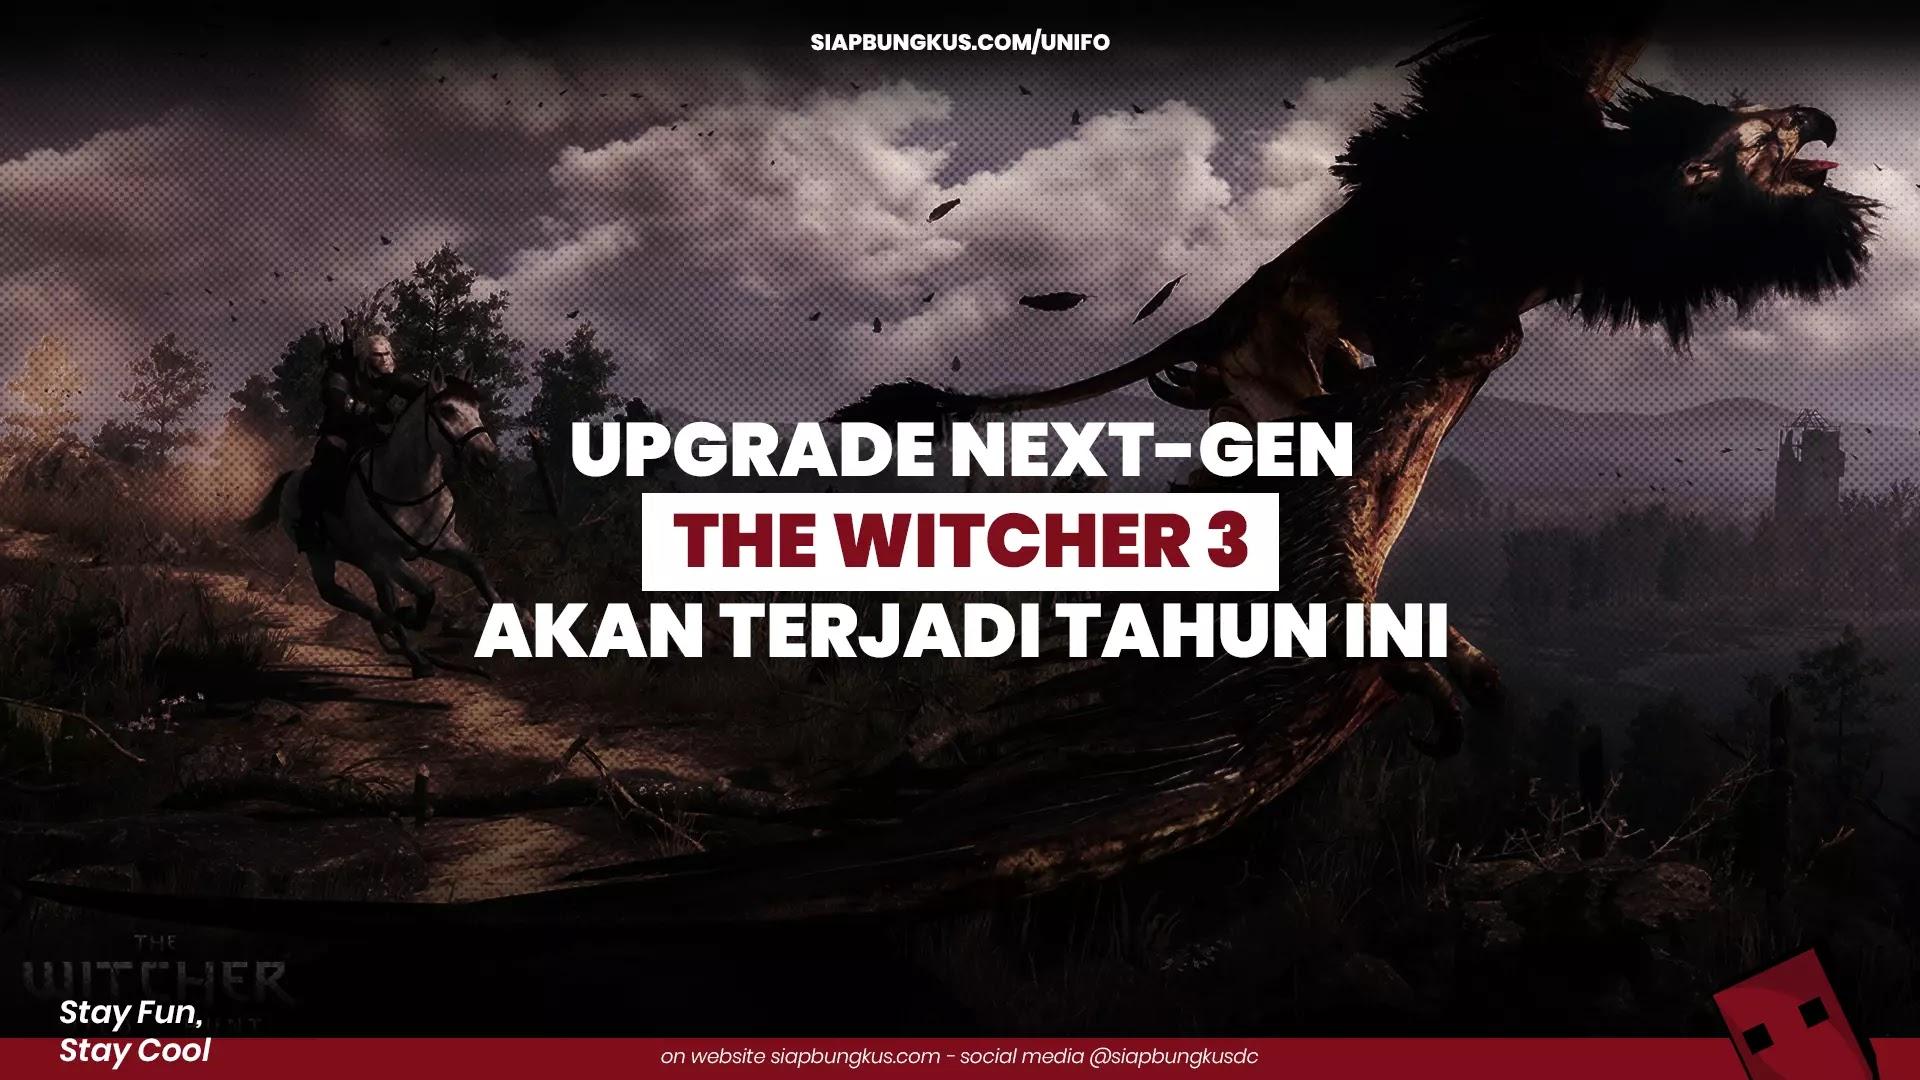 Upgrade Next-Gen The Witcher 3 Akan Terjadi Tahun Ini